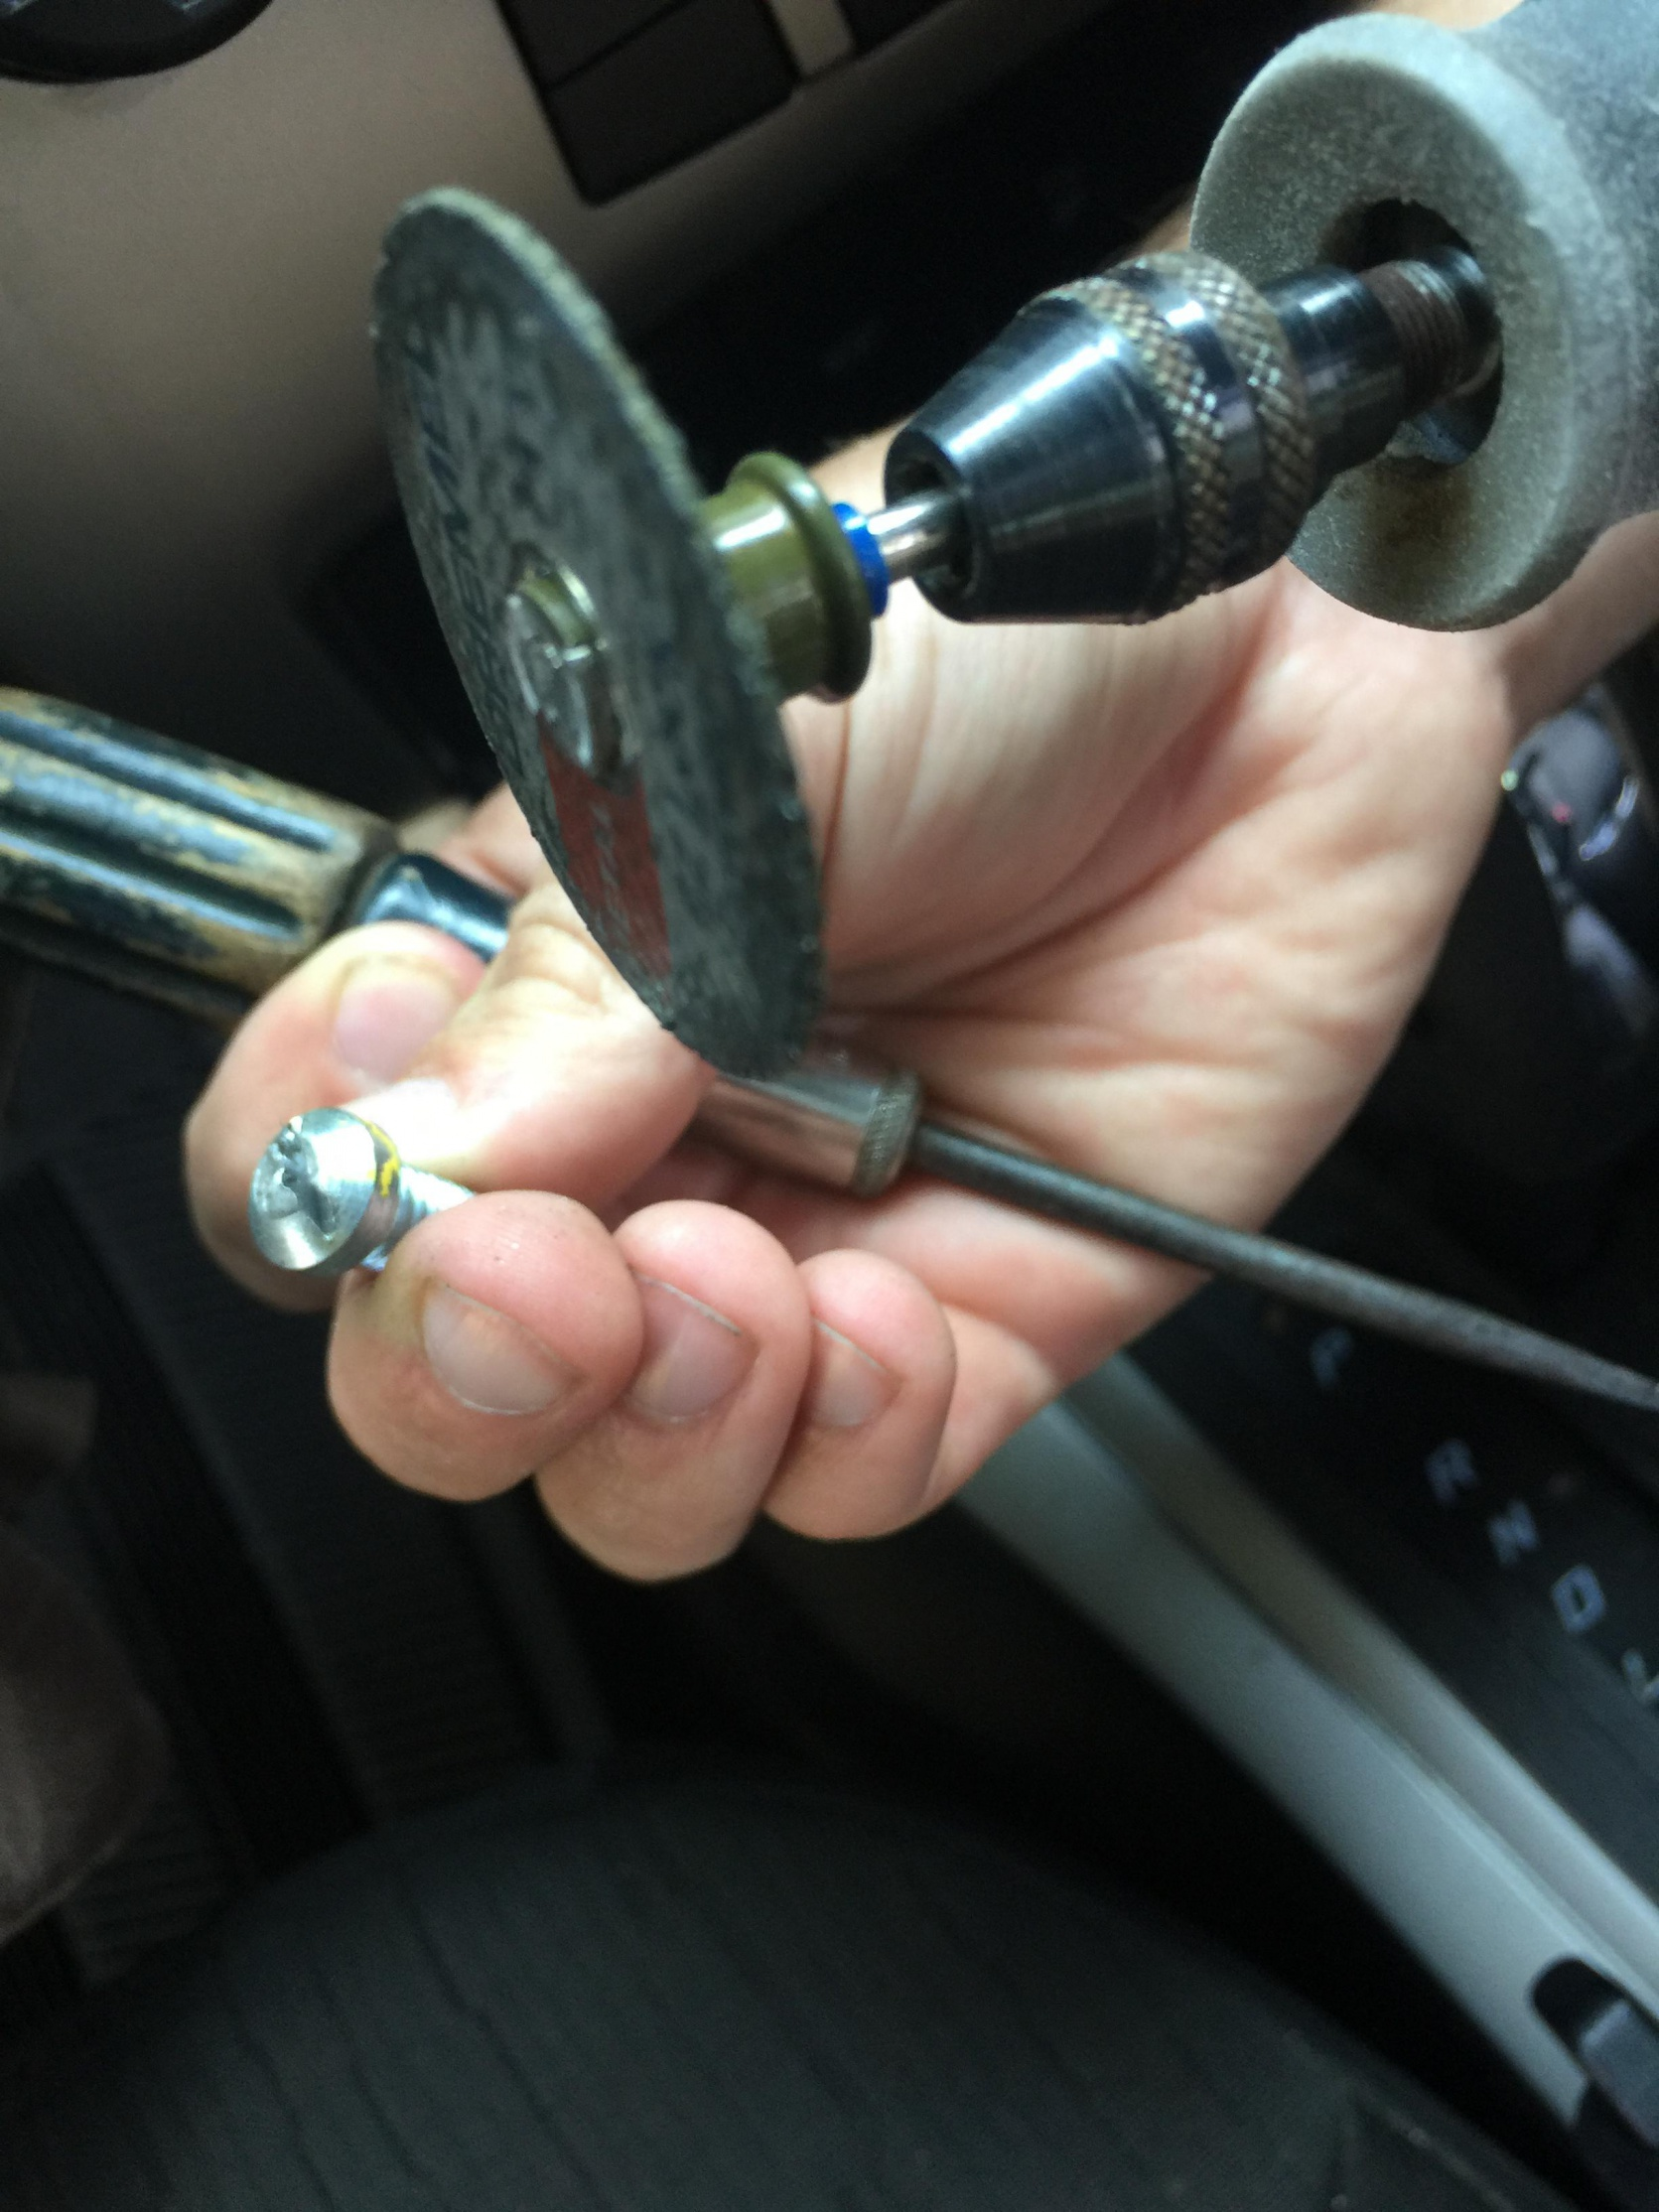 Turn key won't start, ignition switch issue-image_1469165955977.jpg